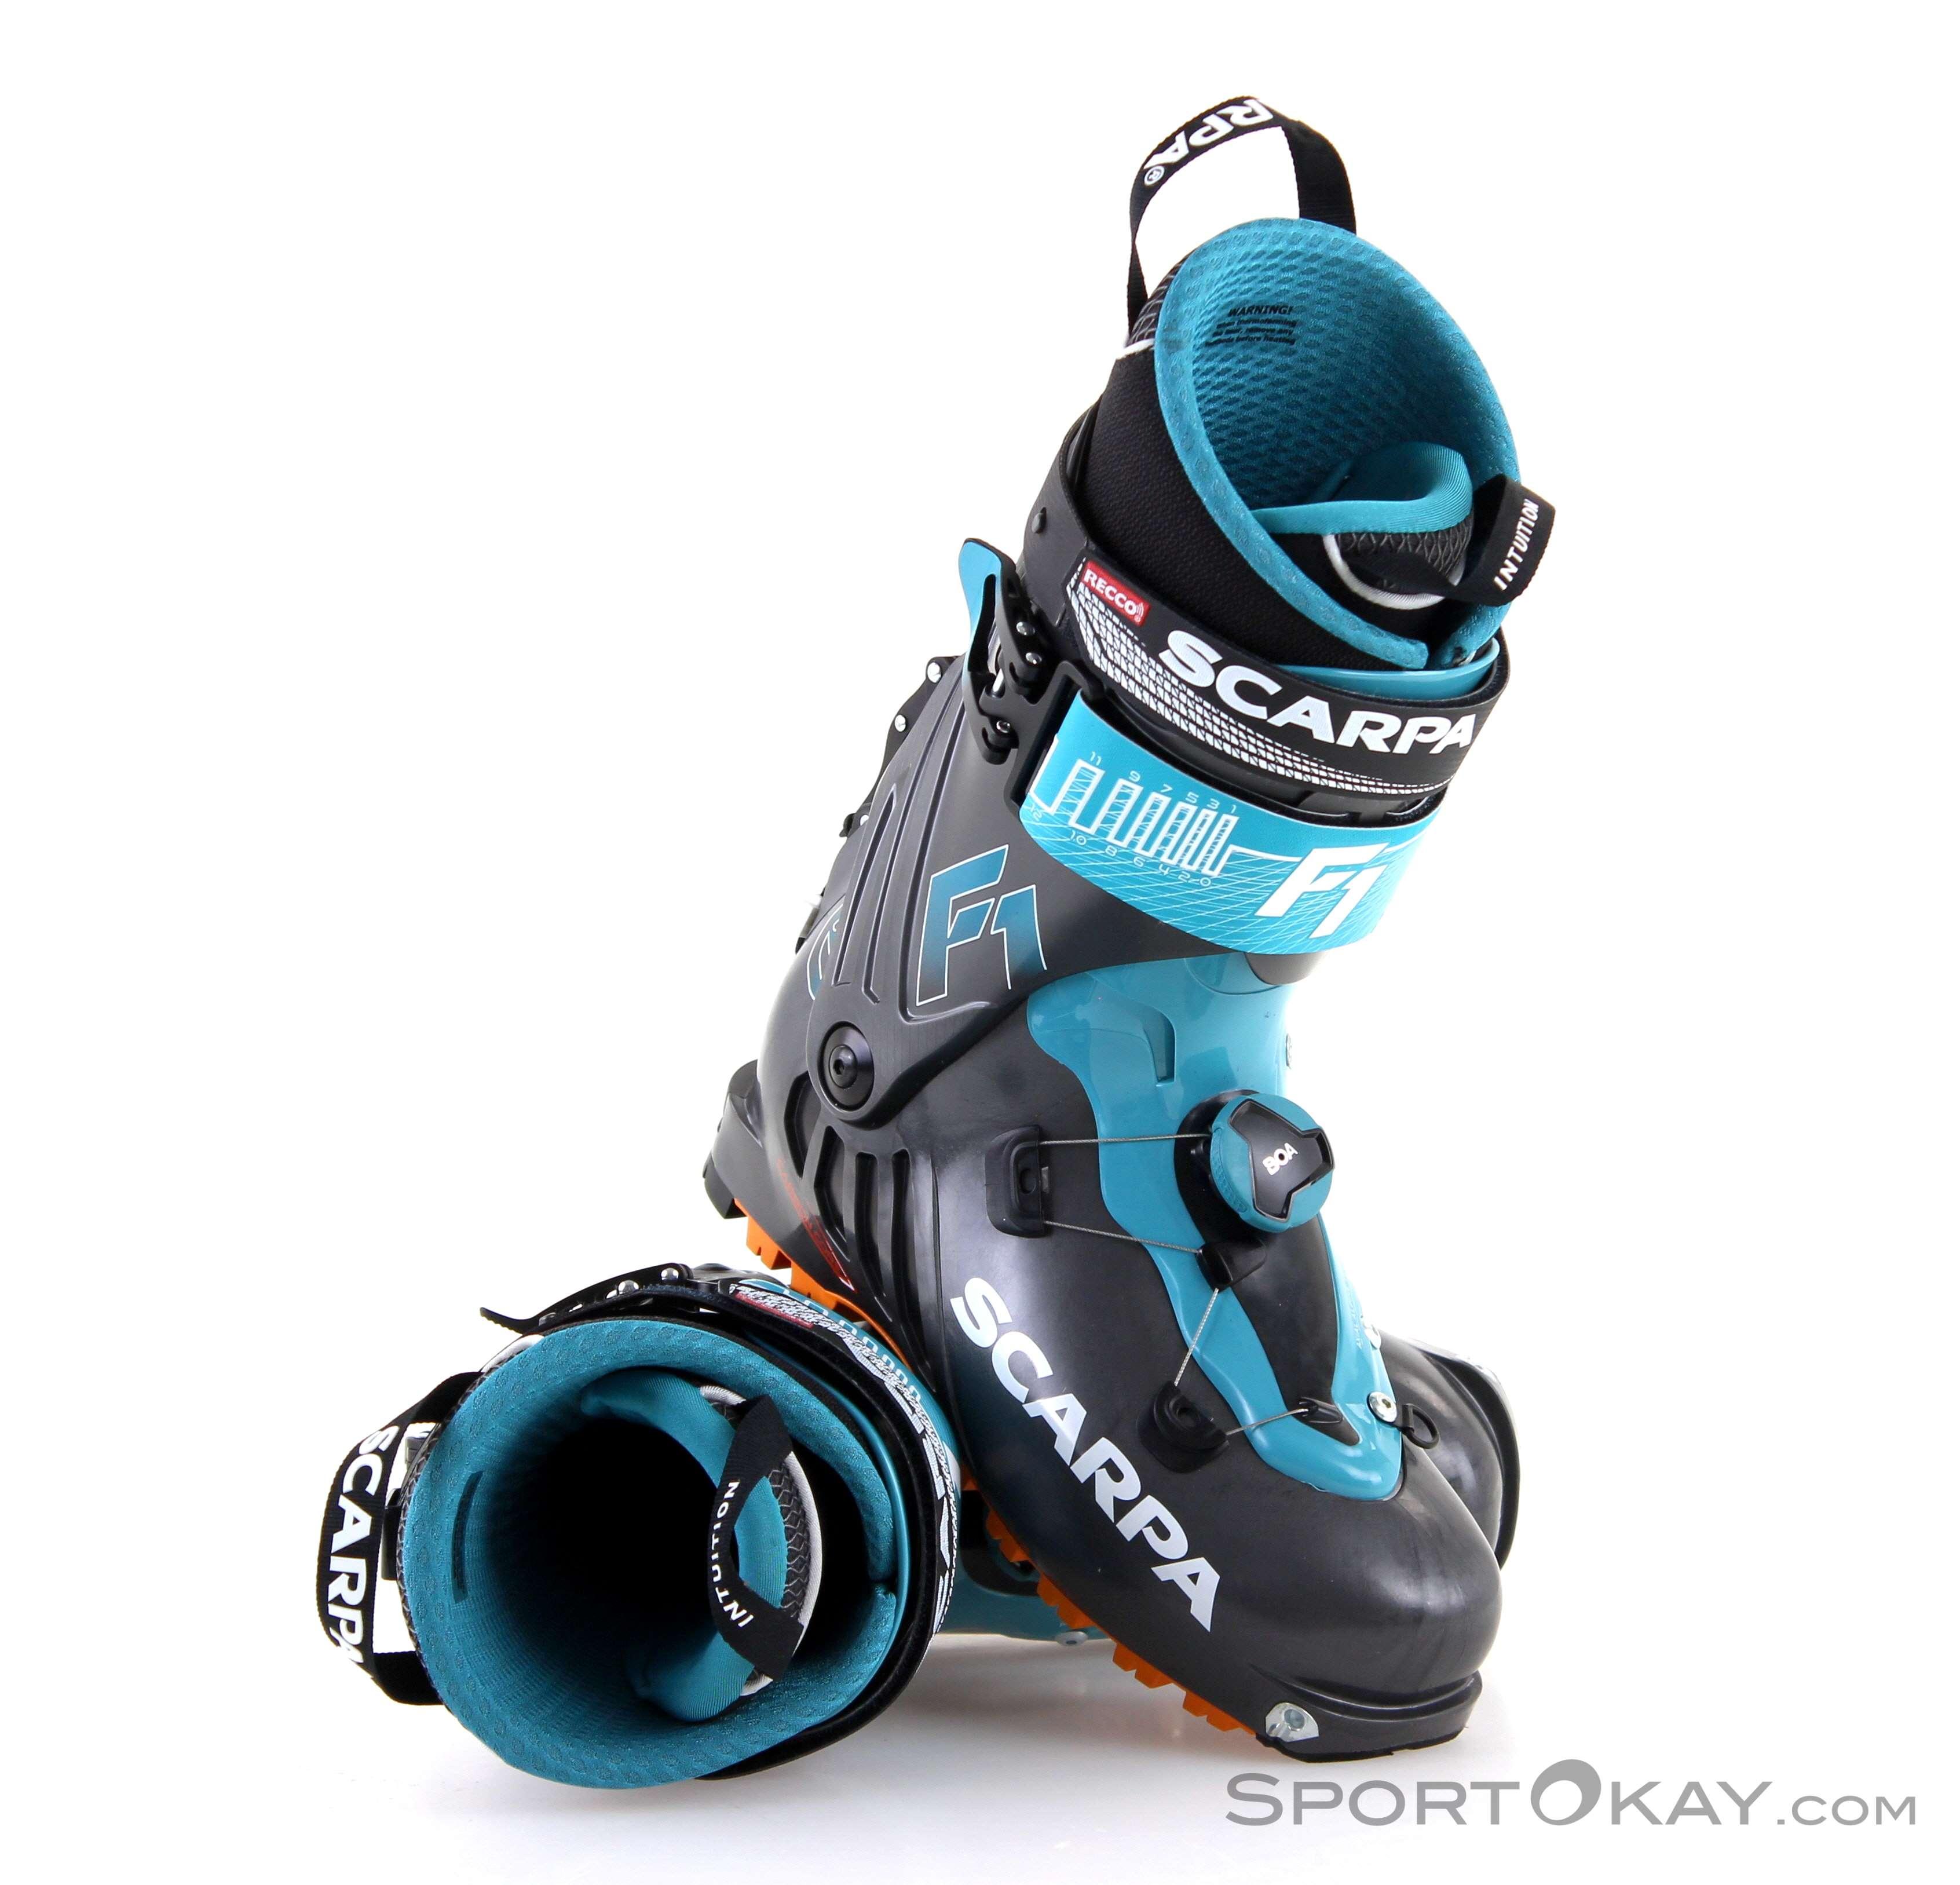 Scarpa F1 Mens Ski Touring Shoes - Ski